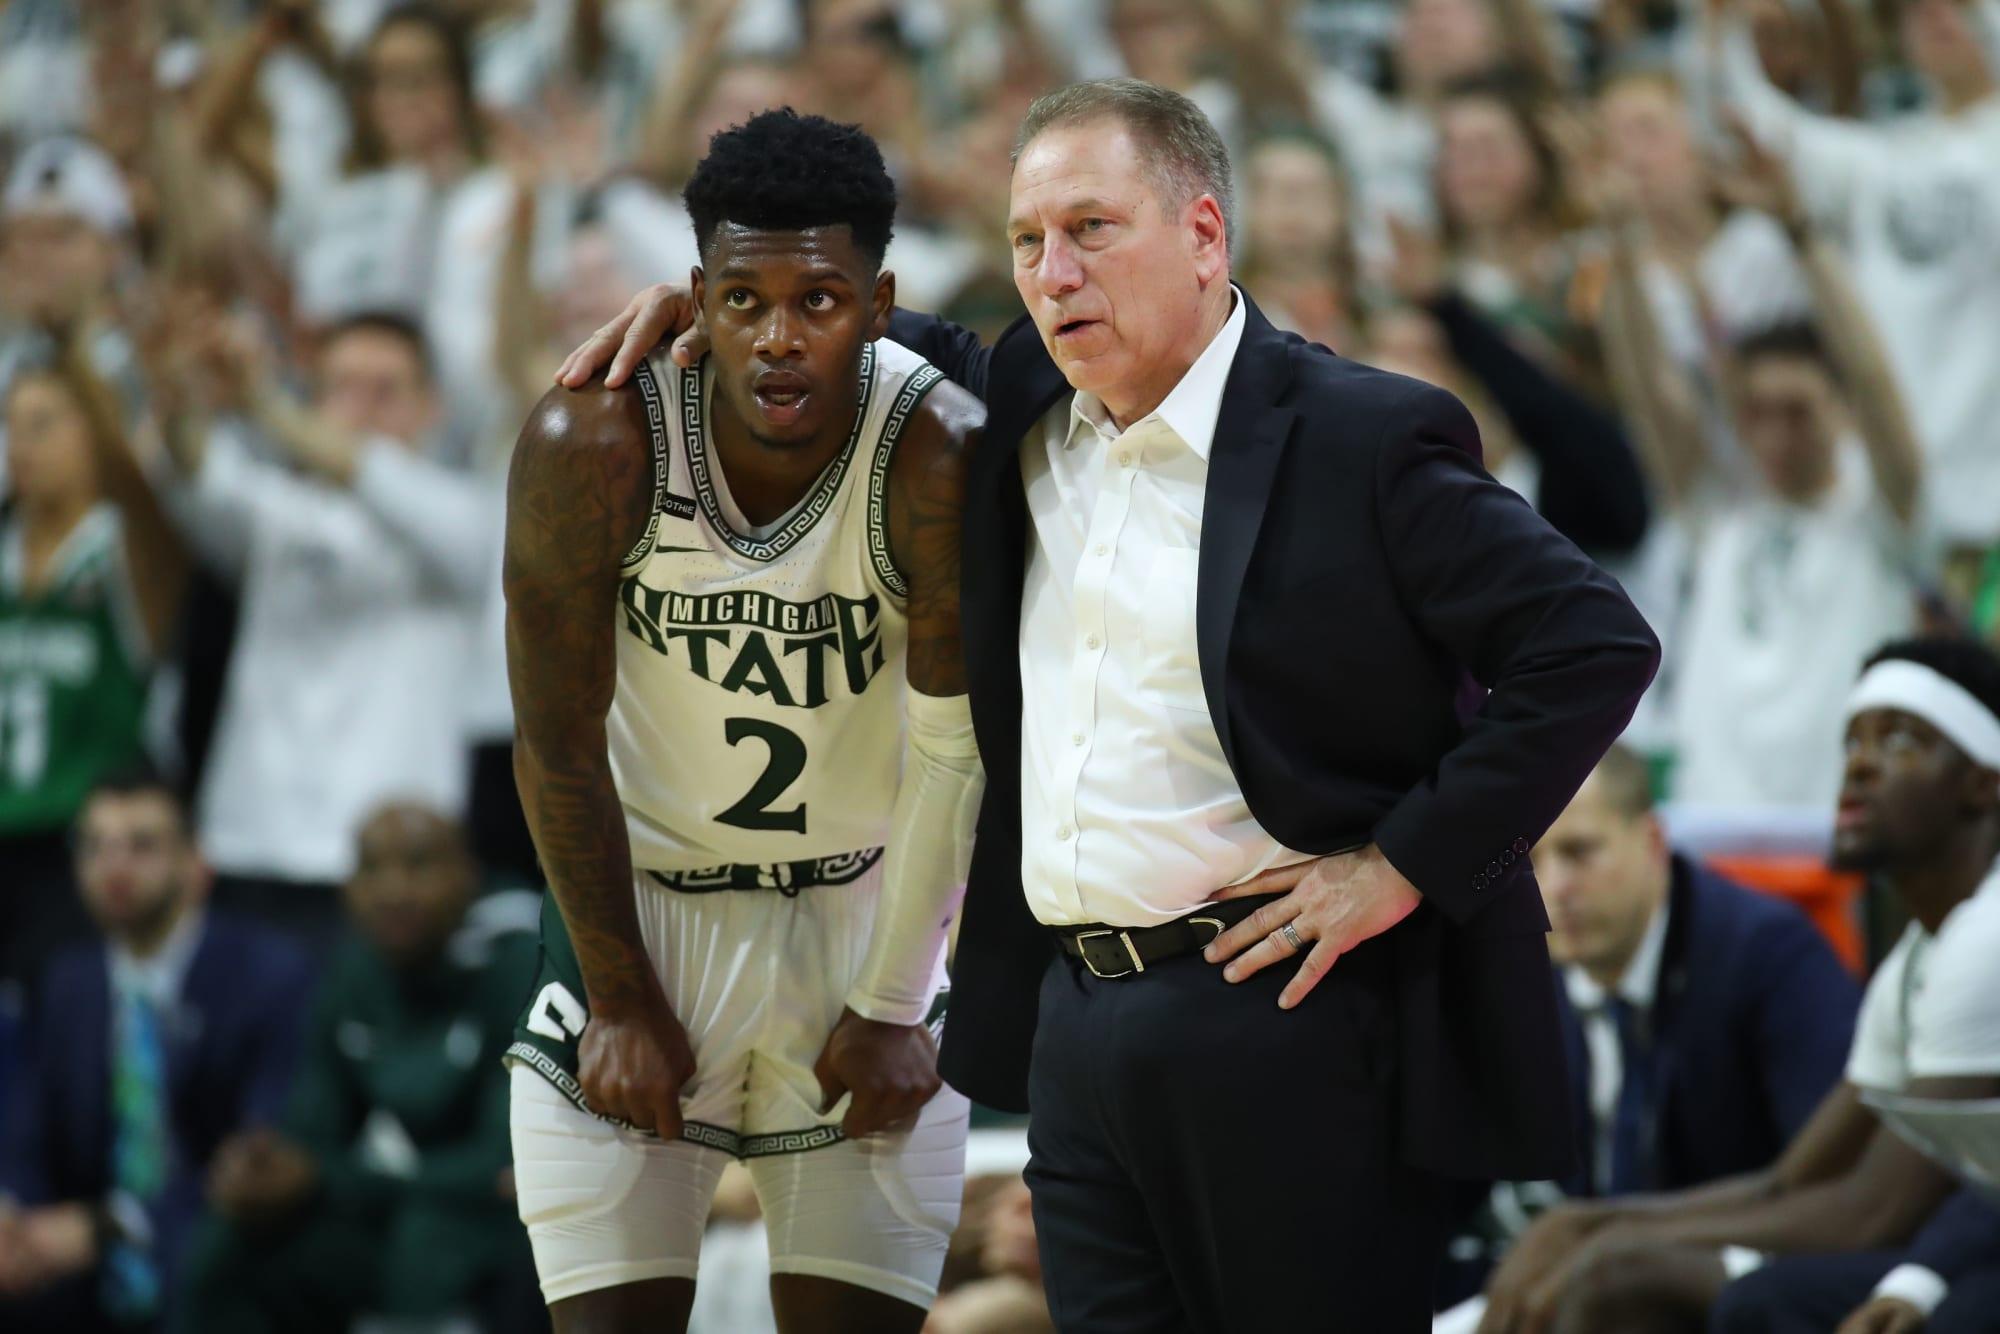 Michigan State Basketball: AJ Hoggard will surprise people in 2020-21